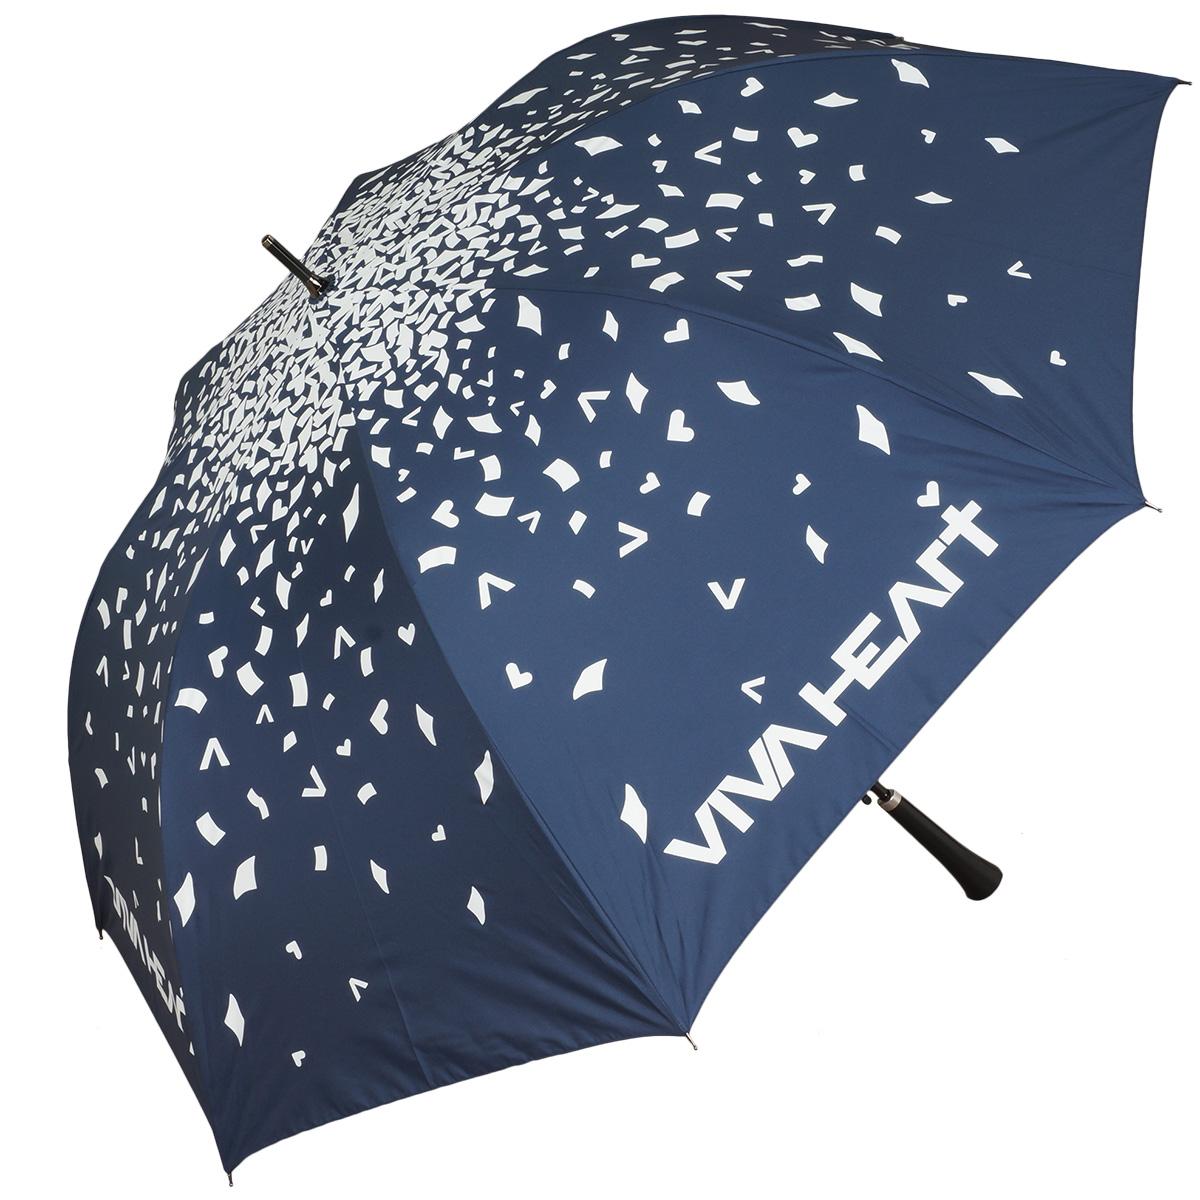 KAMI-FUBUKIプリント 晴雨兼用傘